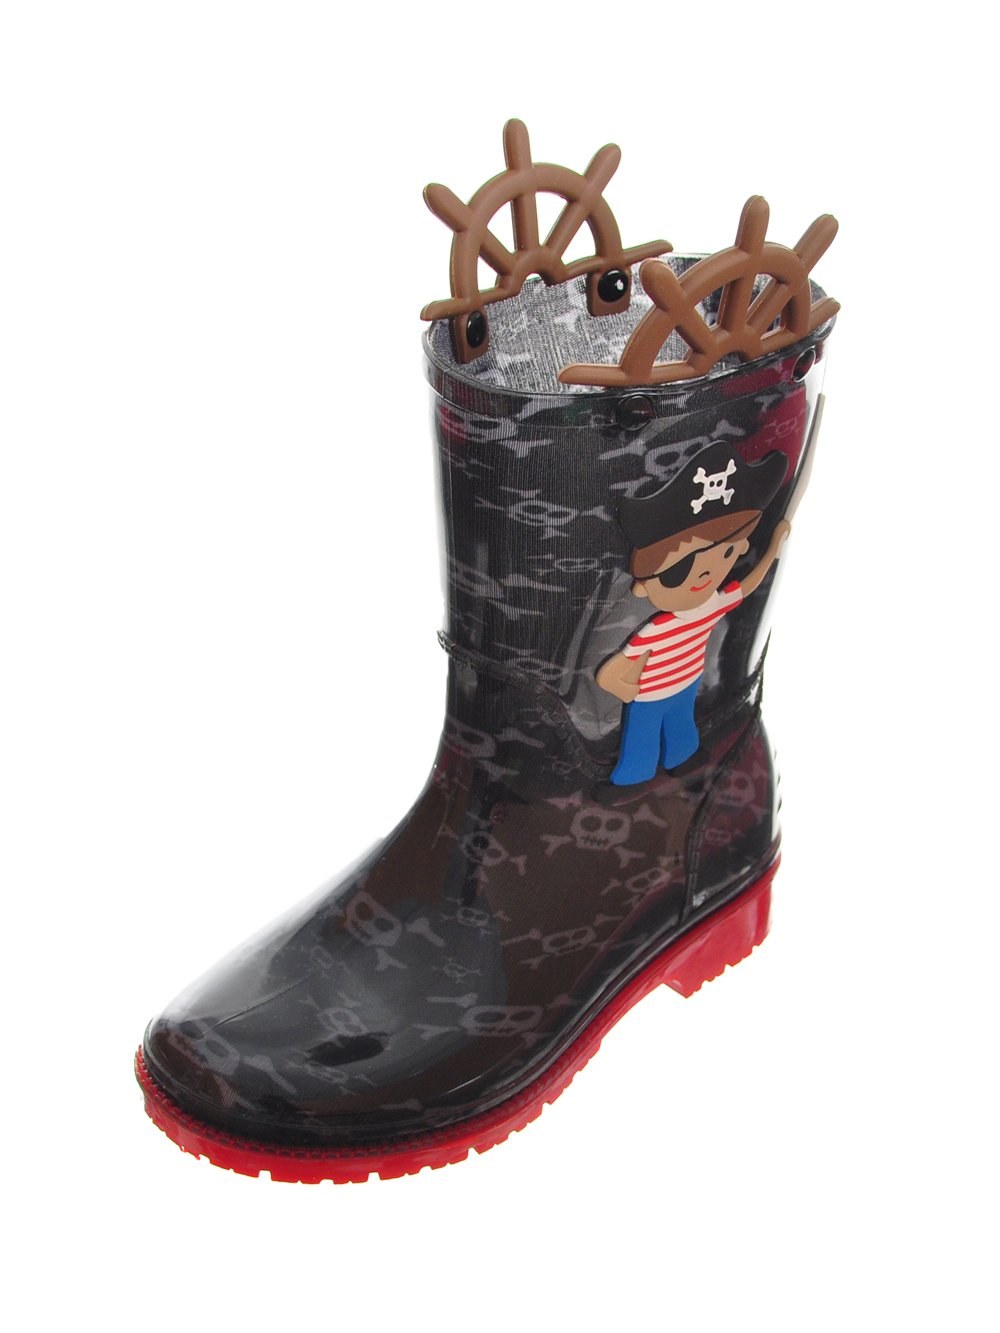 Splash Me Boys' Rubber Rain Boots - Black, 5 Toddler